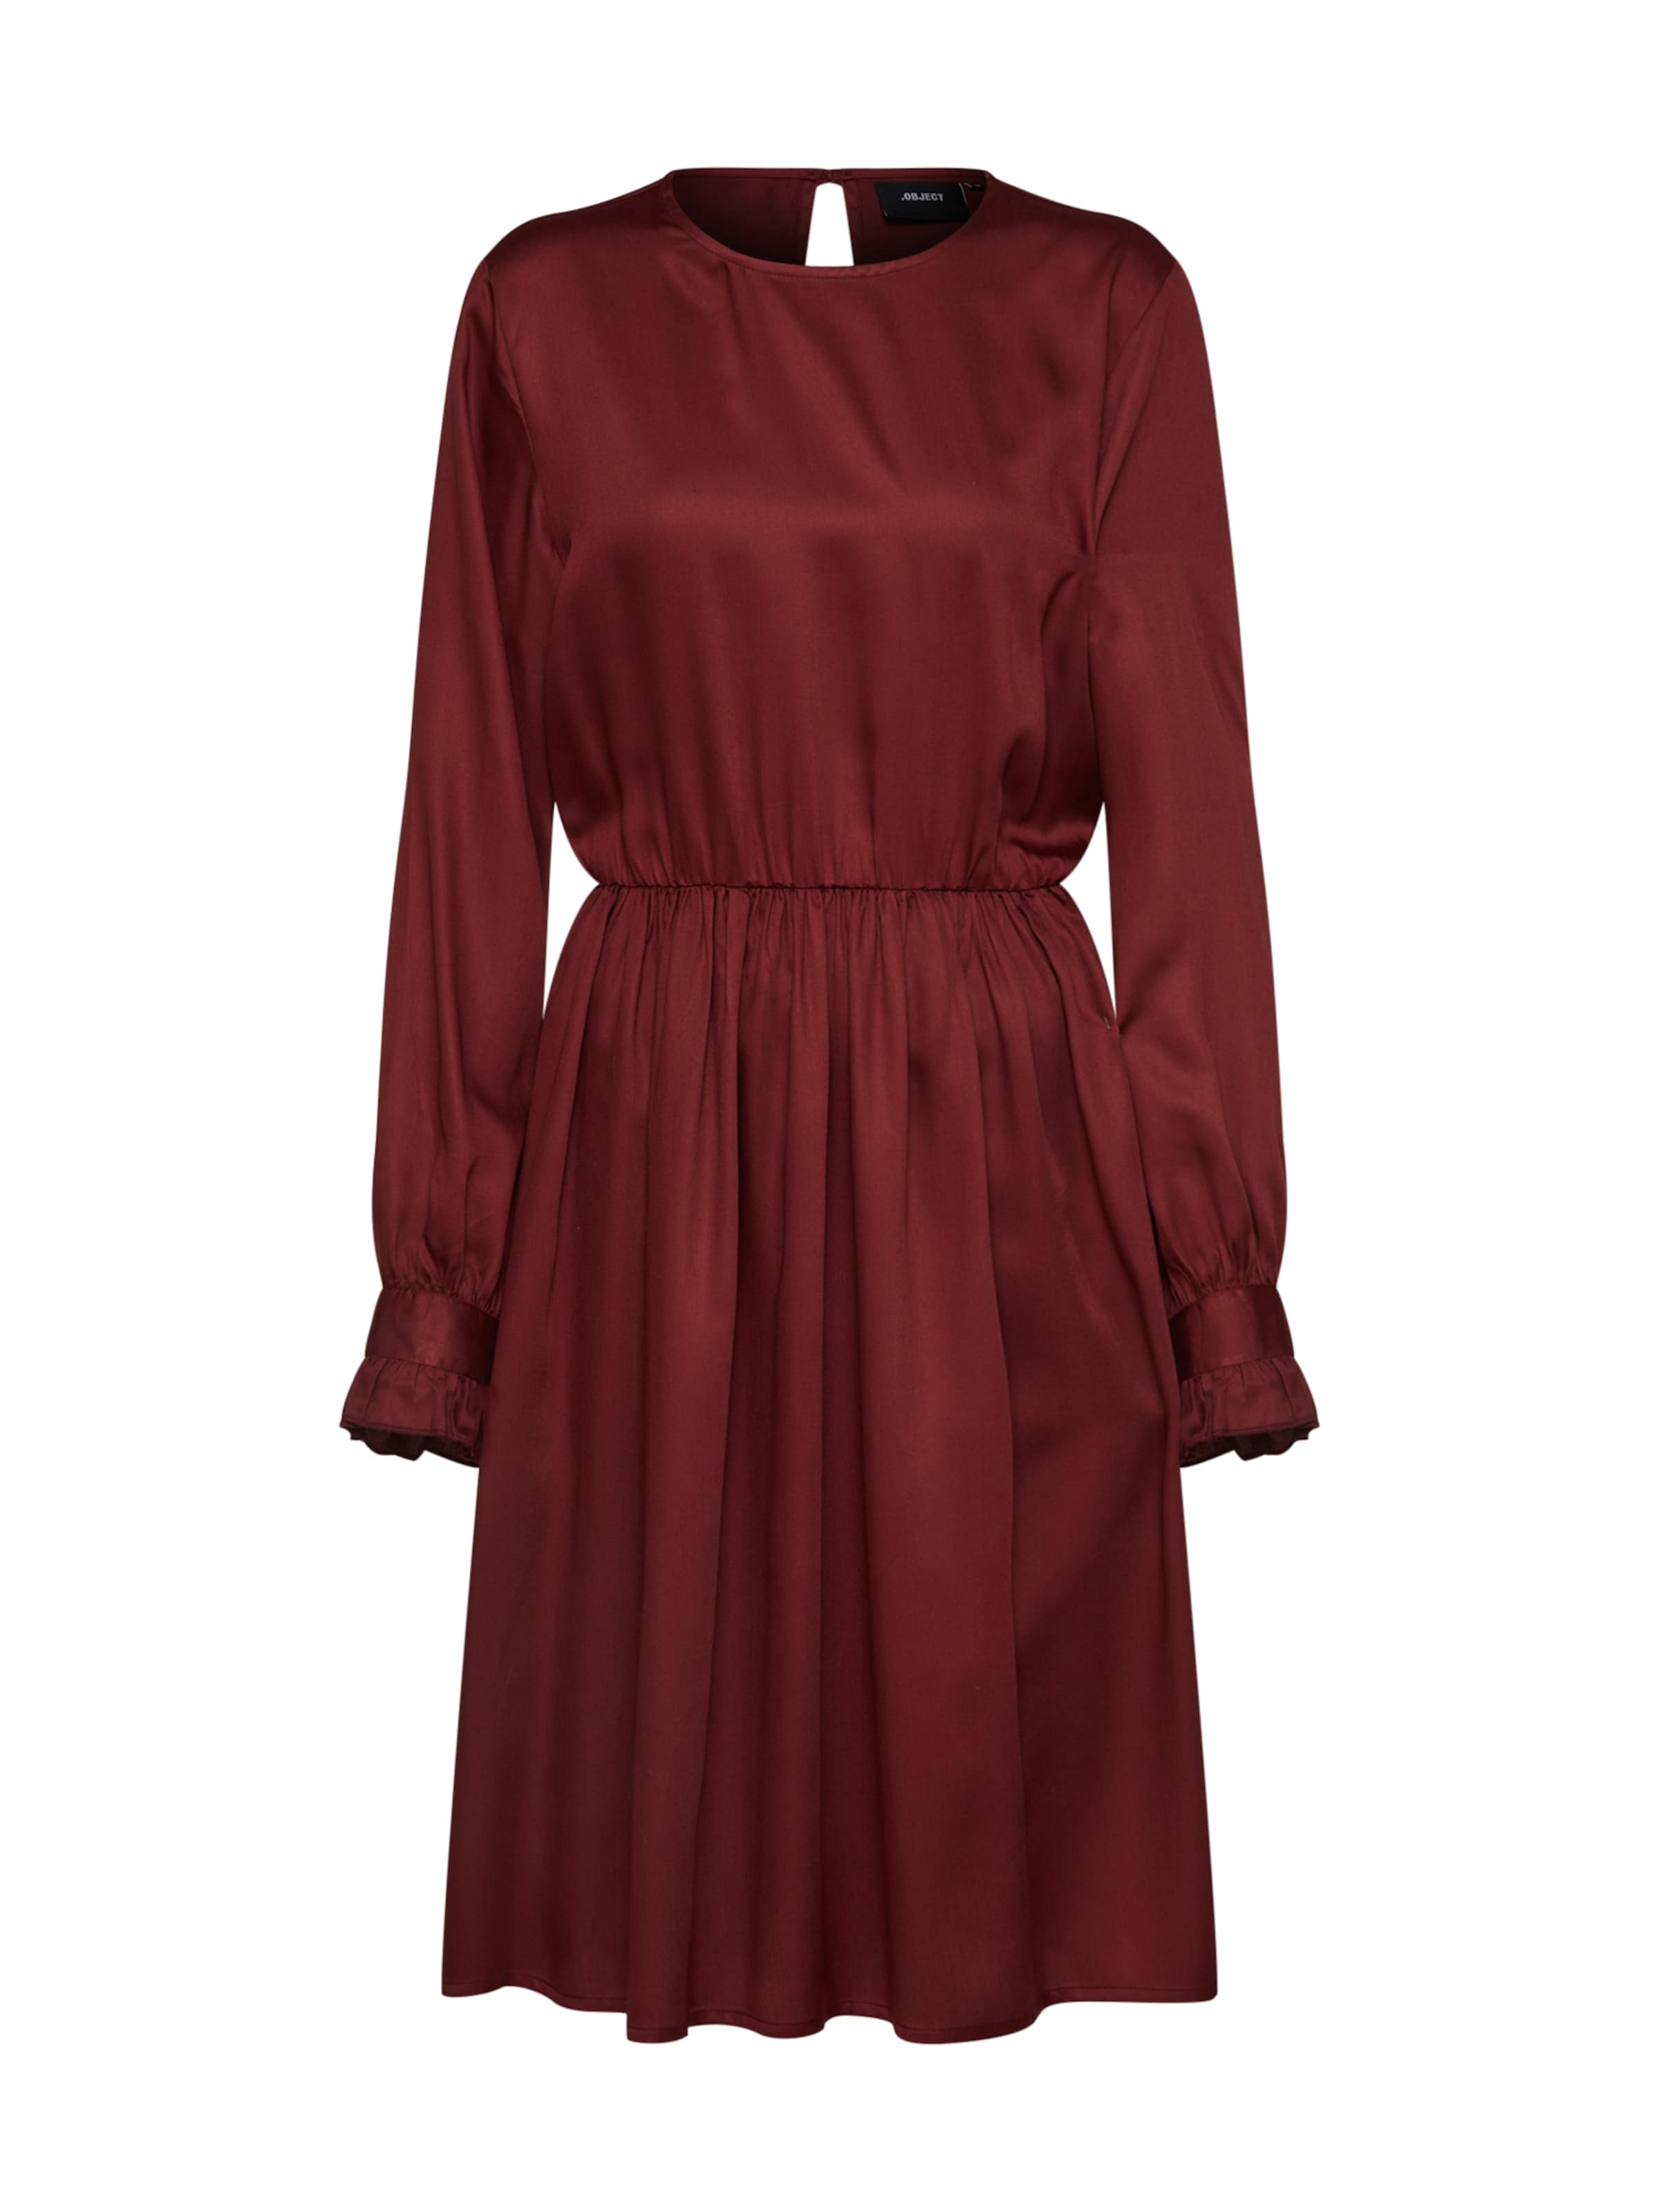 chemise En Object Robe chemise Object Robe En Bordeaux j3RLq54A